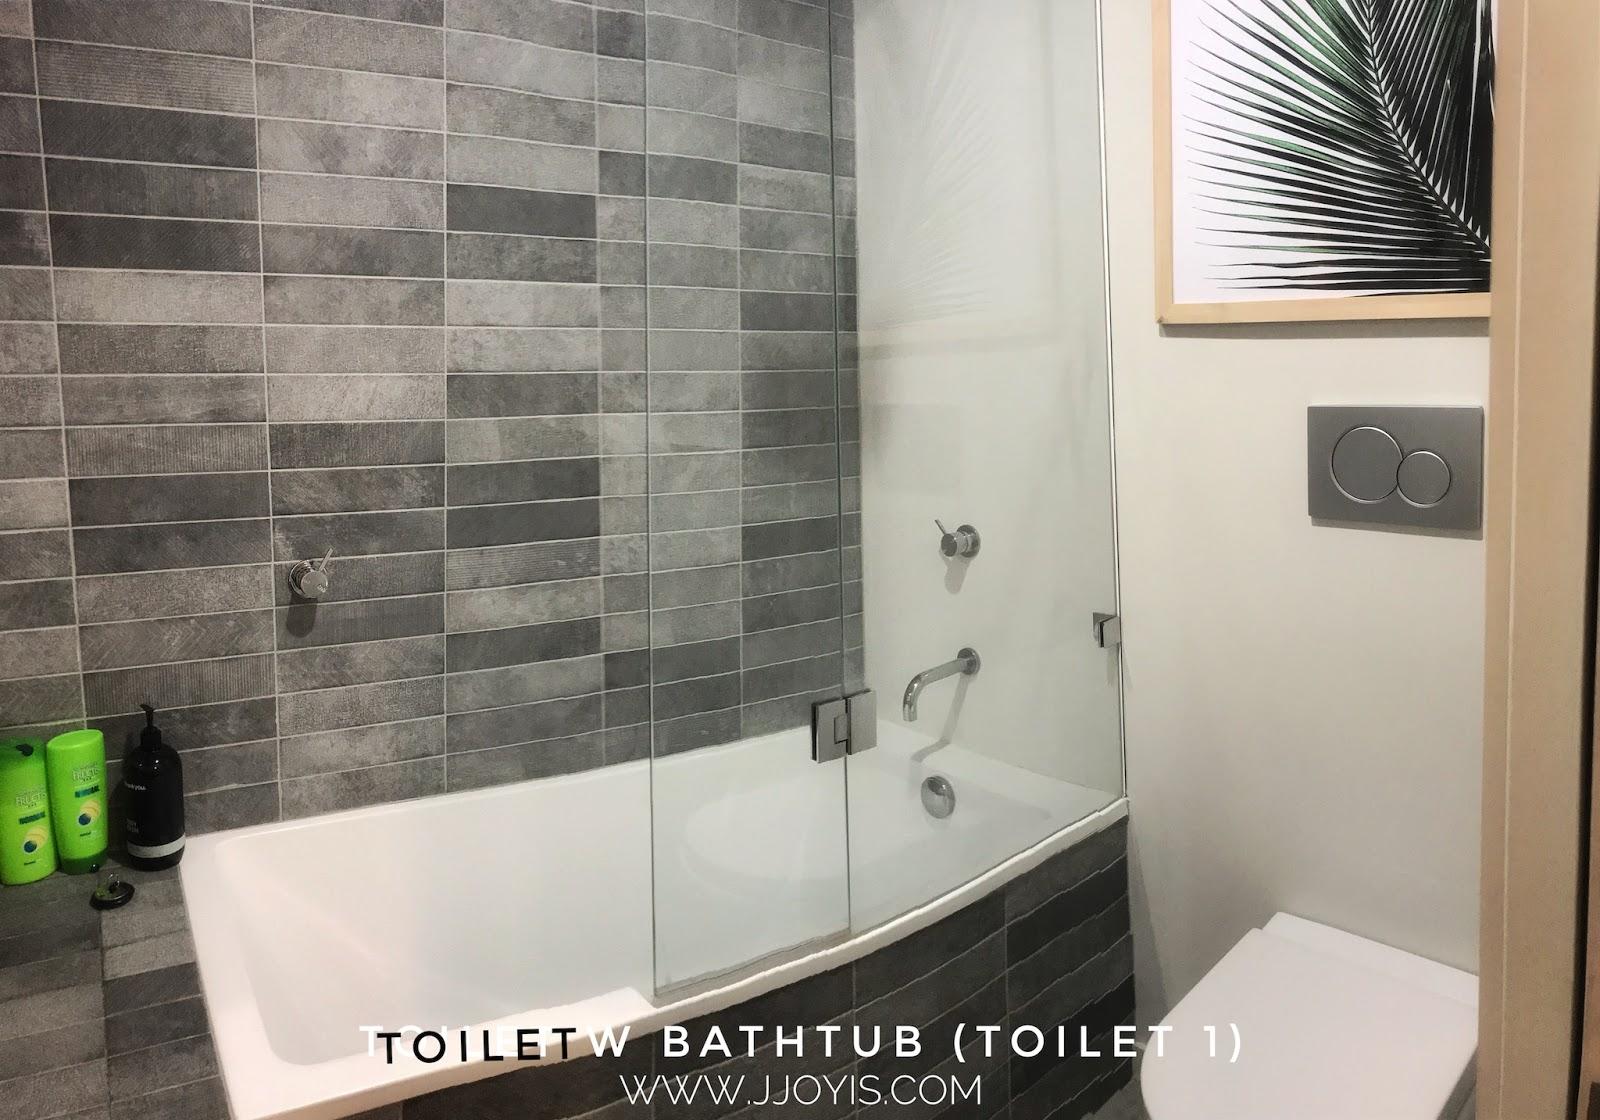 Airbnb for large groups (sleep 7) in Brisbane CBD toilet bathtub